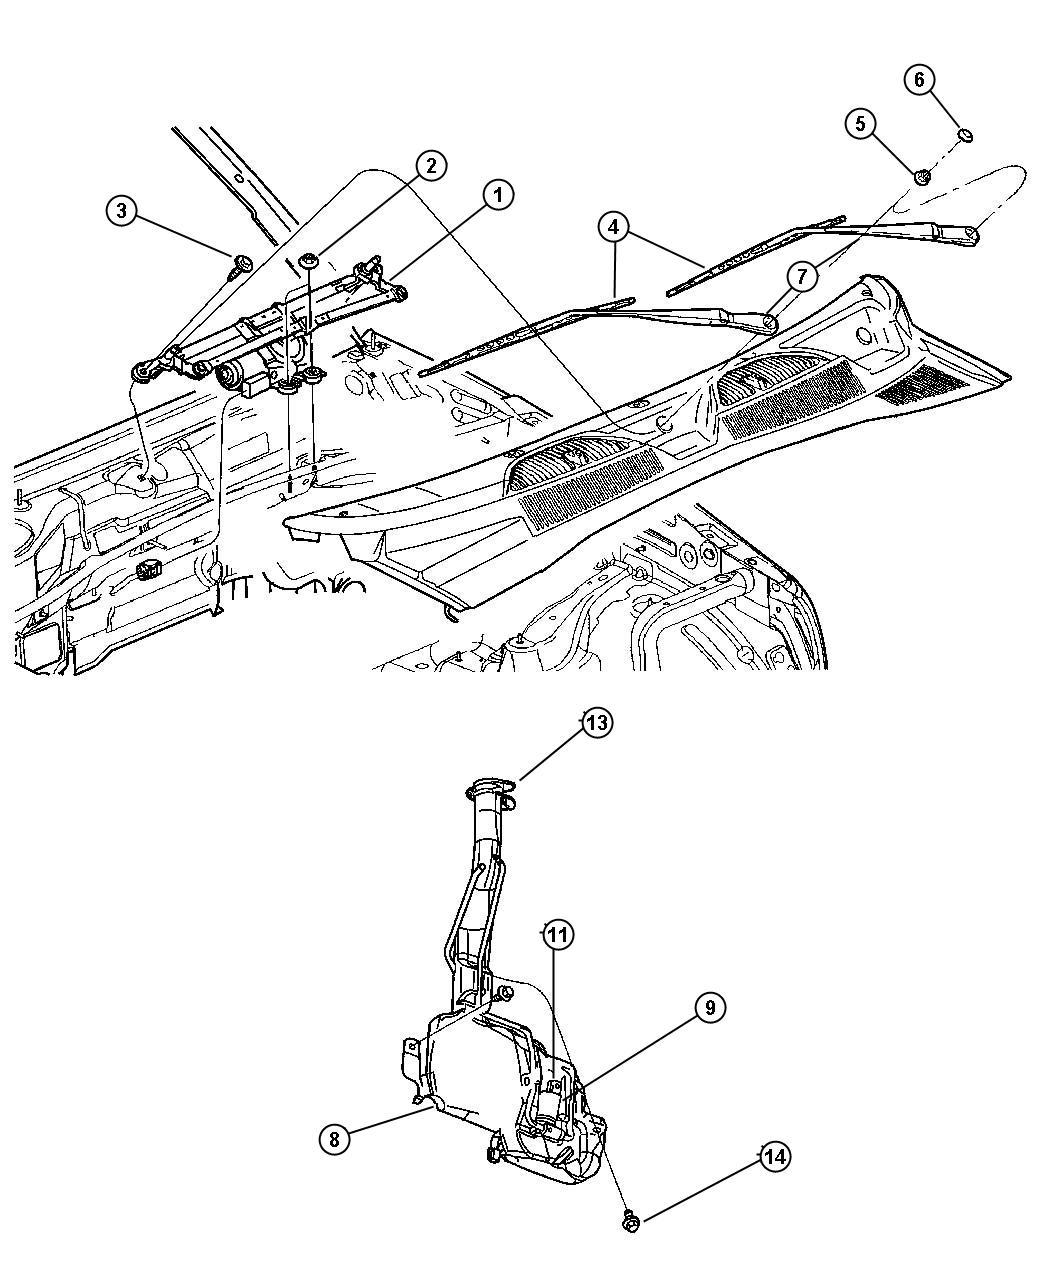 Jeep Liberty Engine Diagram Windshield Sprayer Auto Electrical 2005 Module Wiper Washer Door